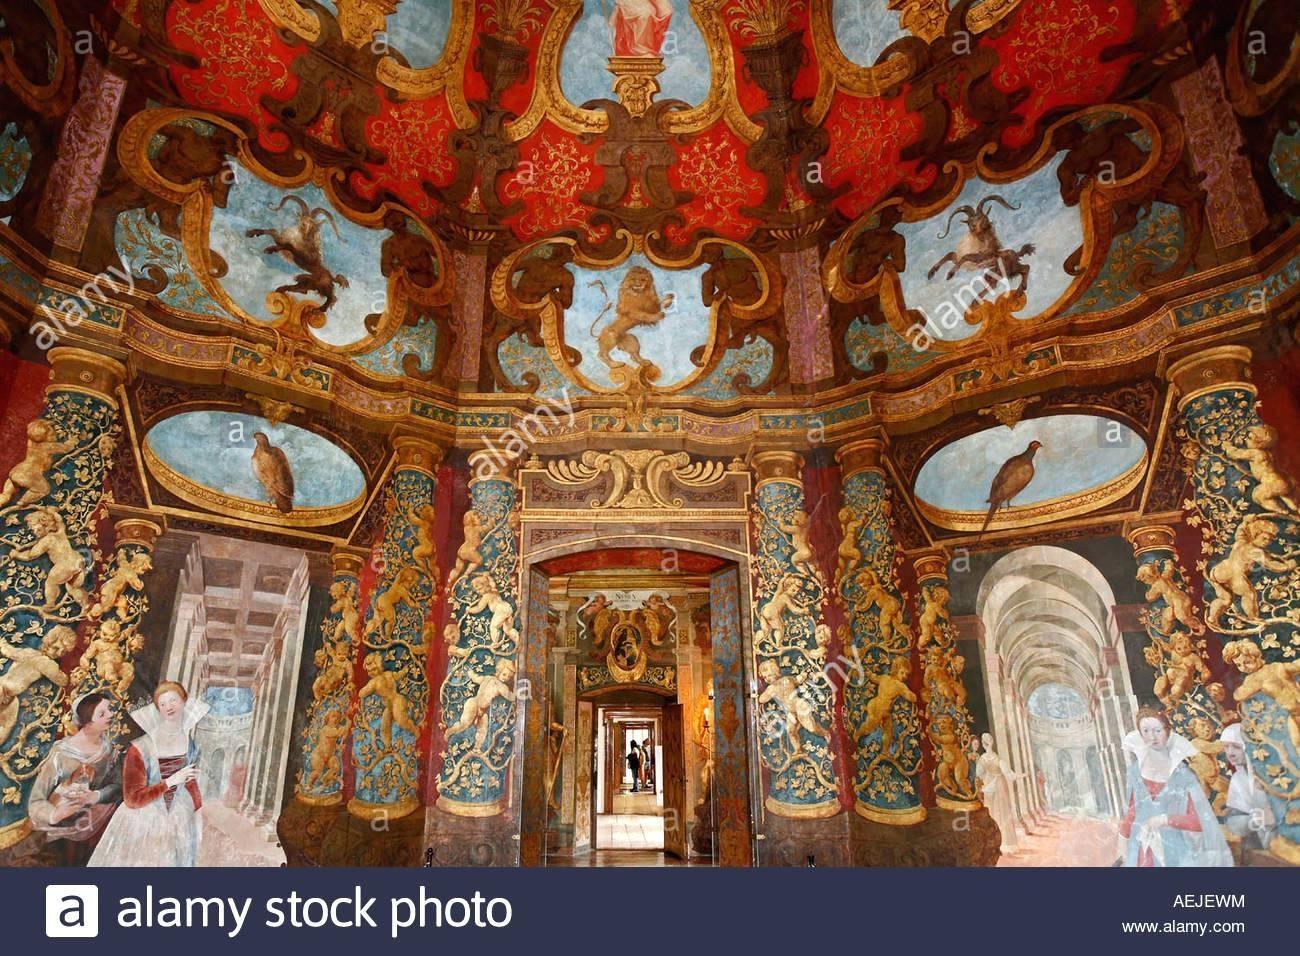 Wall Ideas : Italian Wall Art Prints Tuscan Italian Canvas Wall Inside Italian Wall Art For Bedroom (Image 14 of 20)